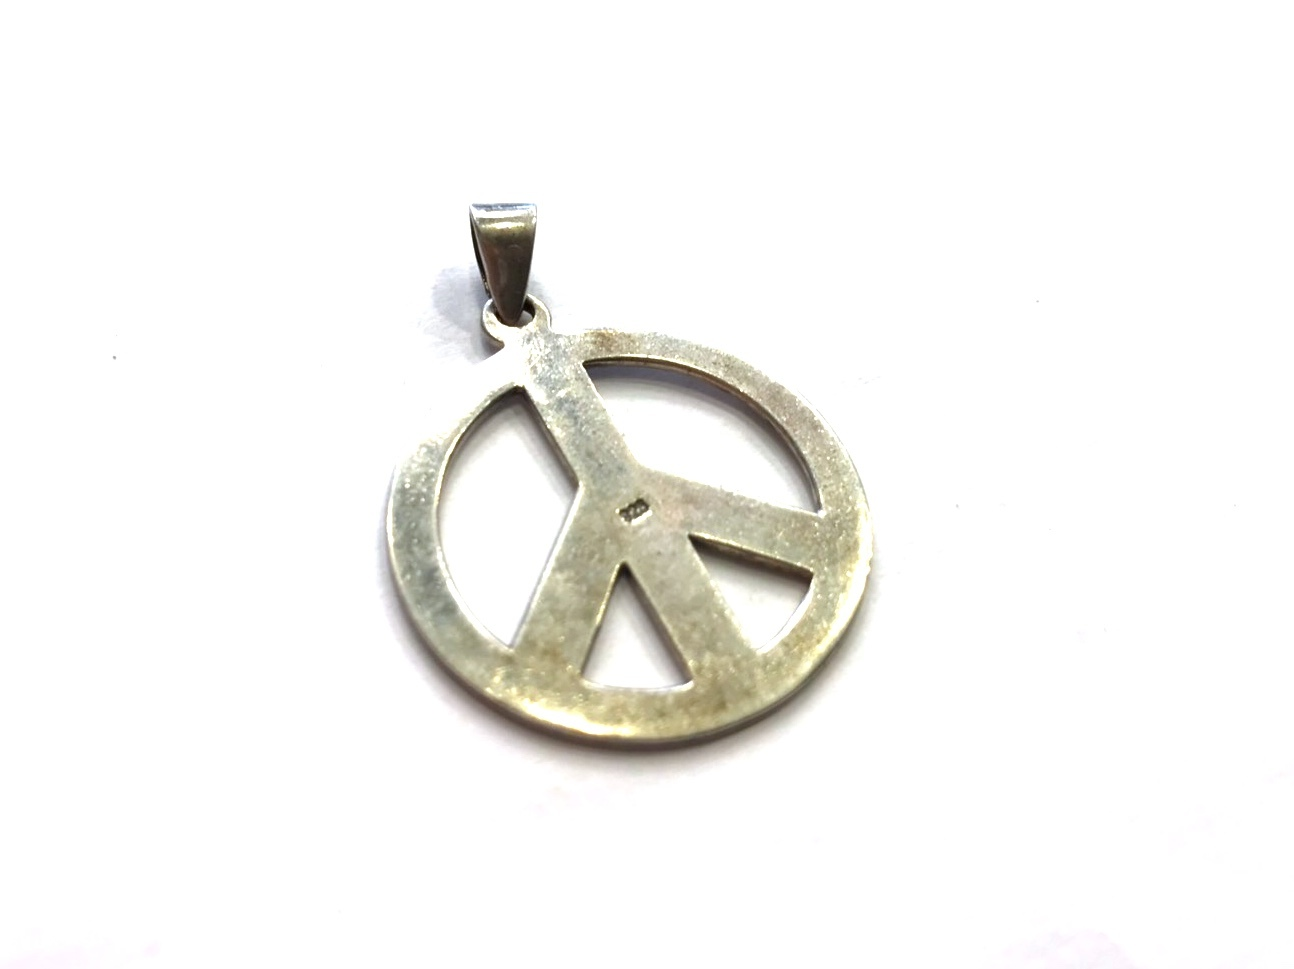 「 GIVE PEACE A CHANCE... 」_c0078333_13443365.jpeg